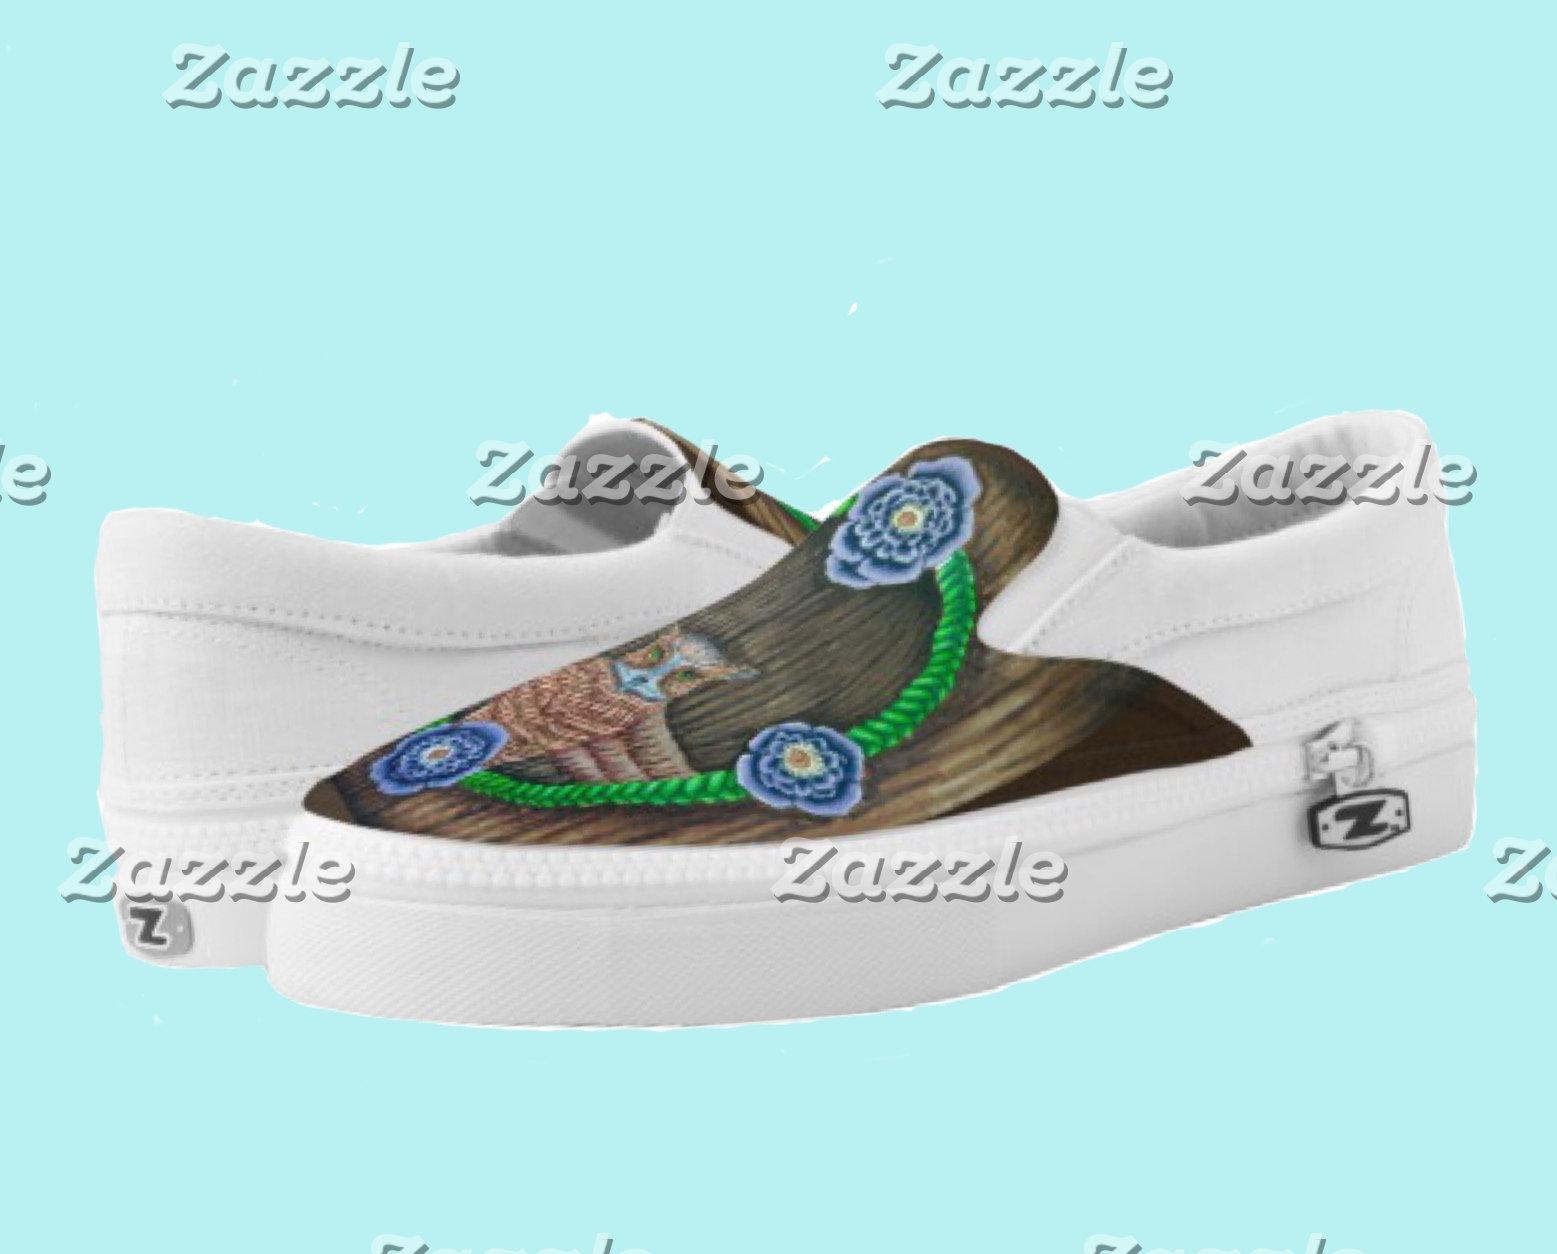 slip-on shoes + Flip-flops